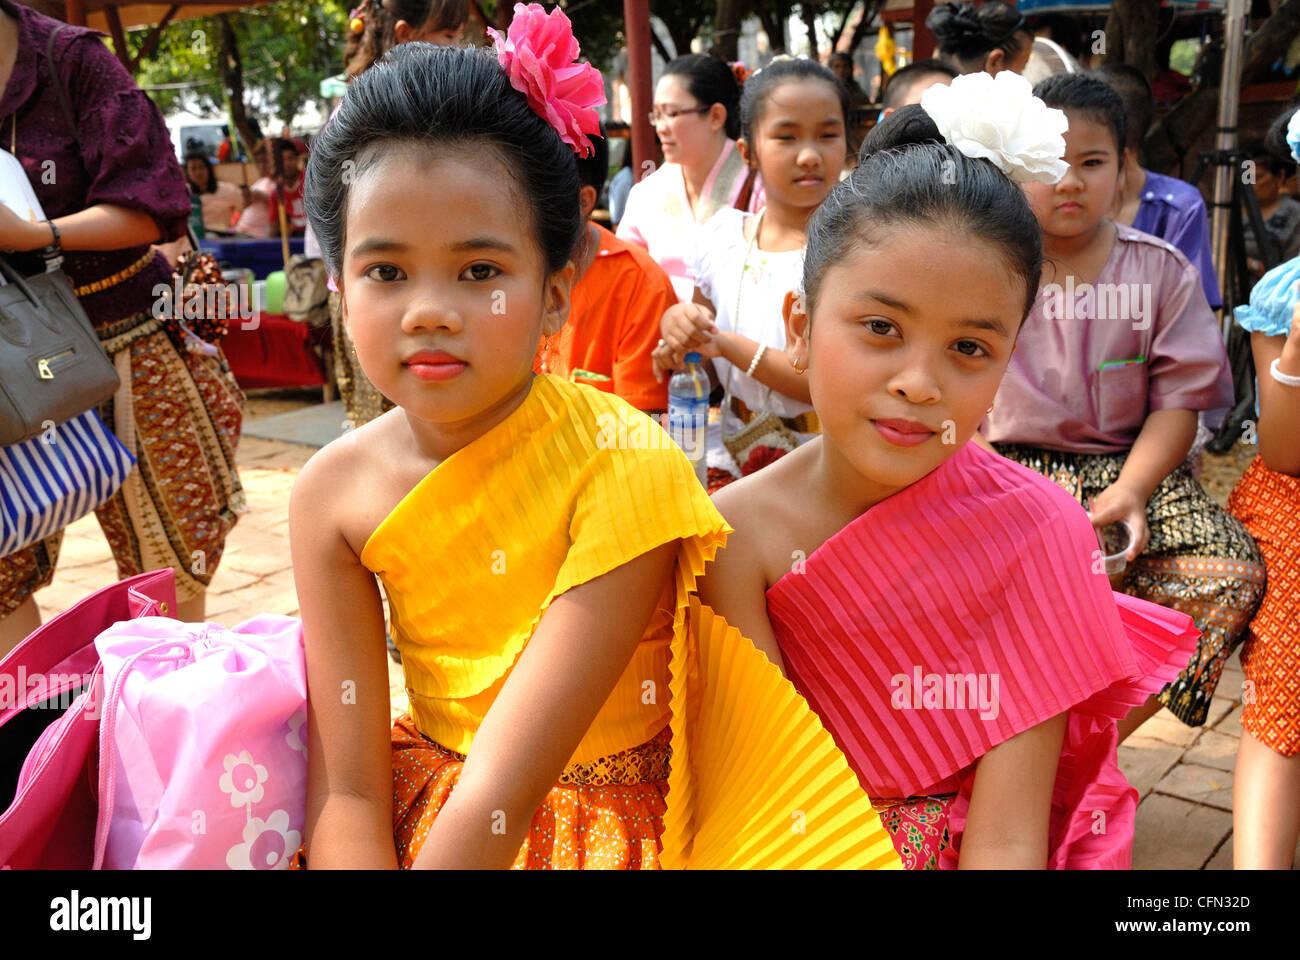 thai child Children inTraditional Thai costume worn at the Lop Buri festival. Lop Buri  Thailand on 15/02/2012